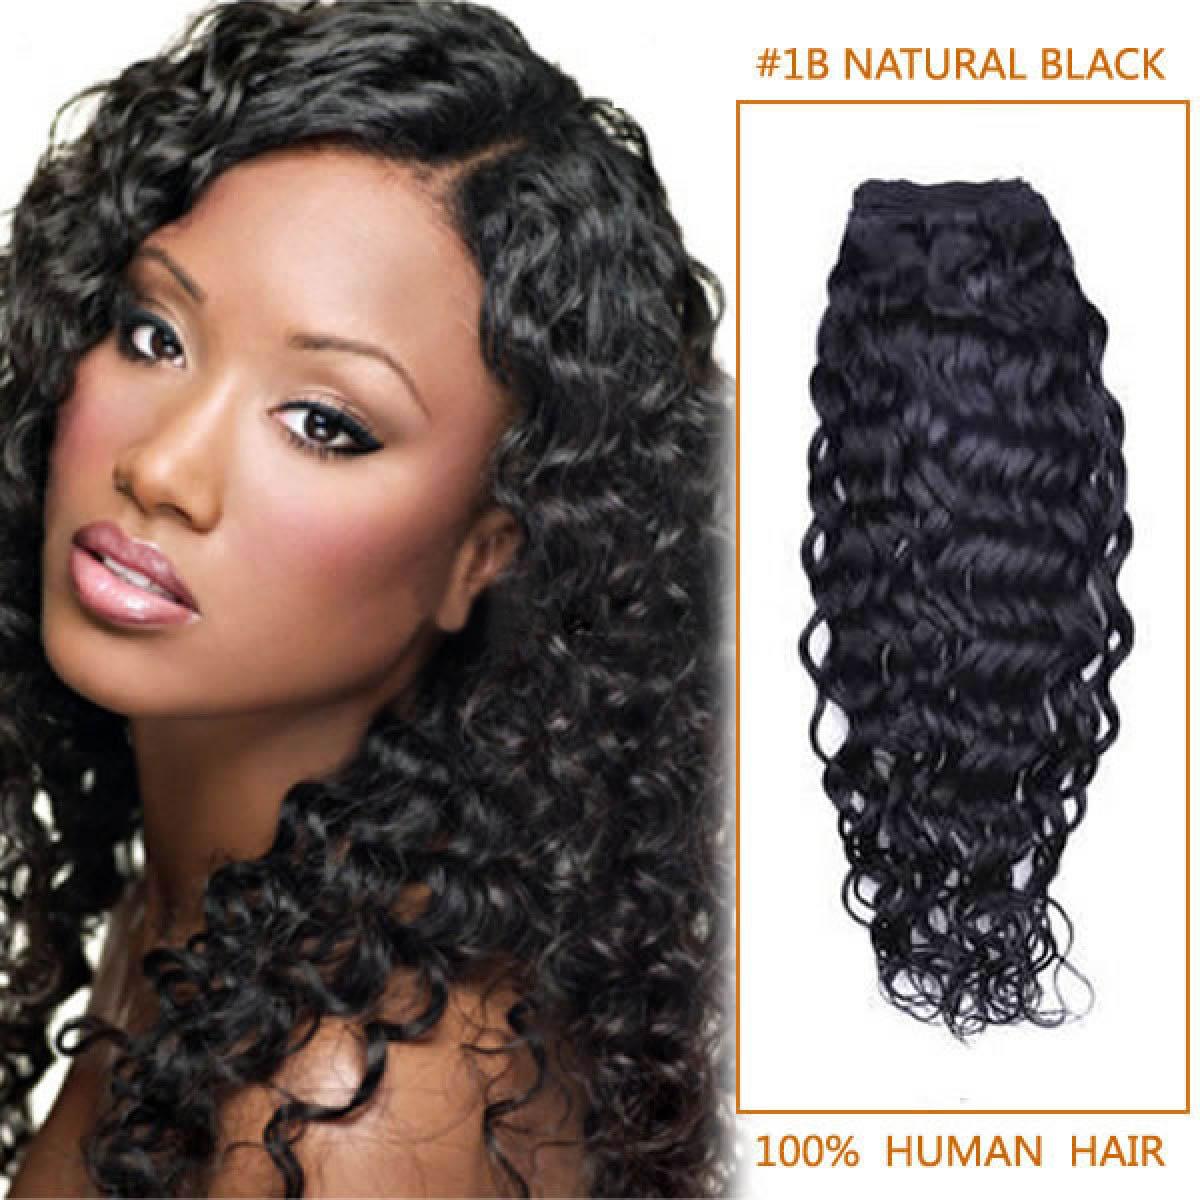 Inch 1b natural black curly indian remy hair wefts 10 inch 1b natural black curly indian remy hair wefts pmusecretfo Choice Image